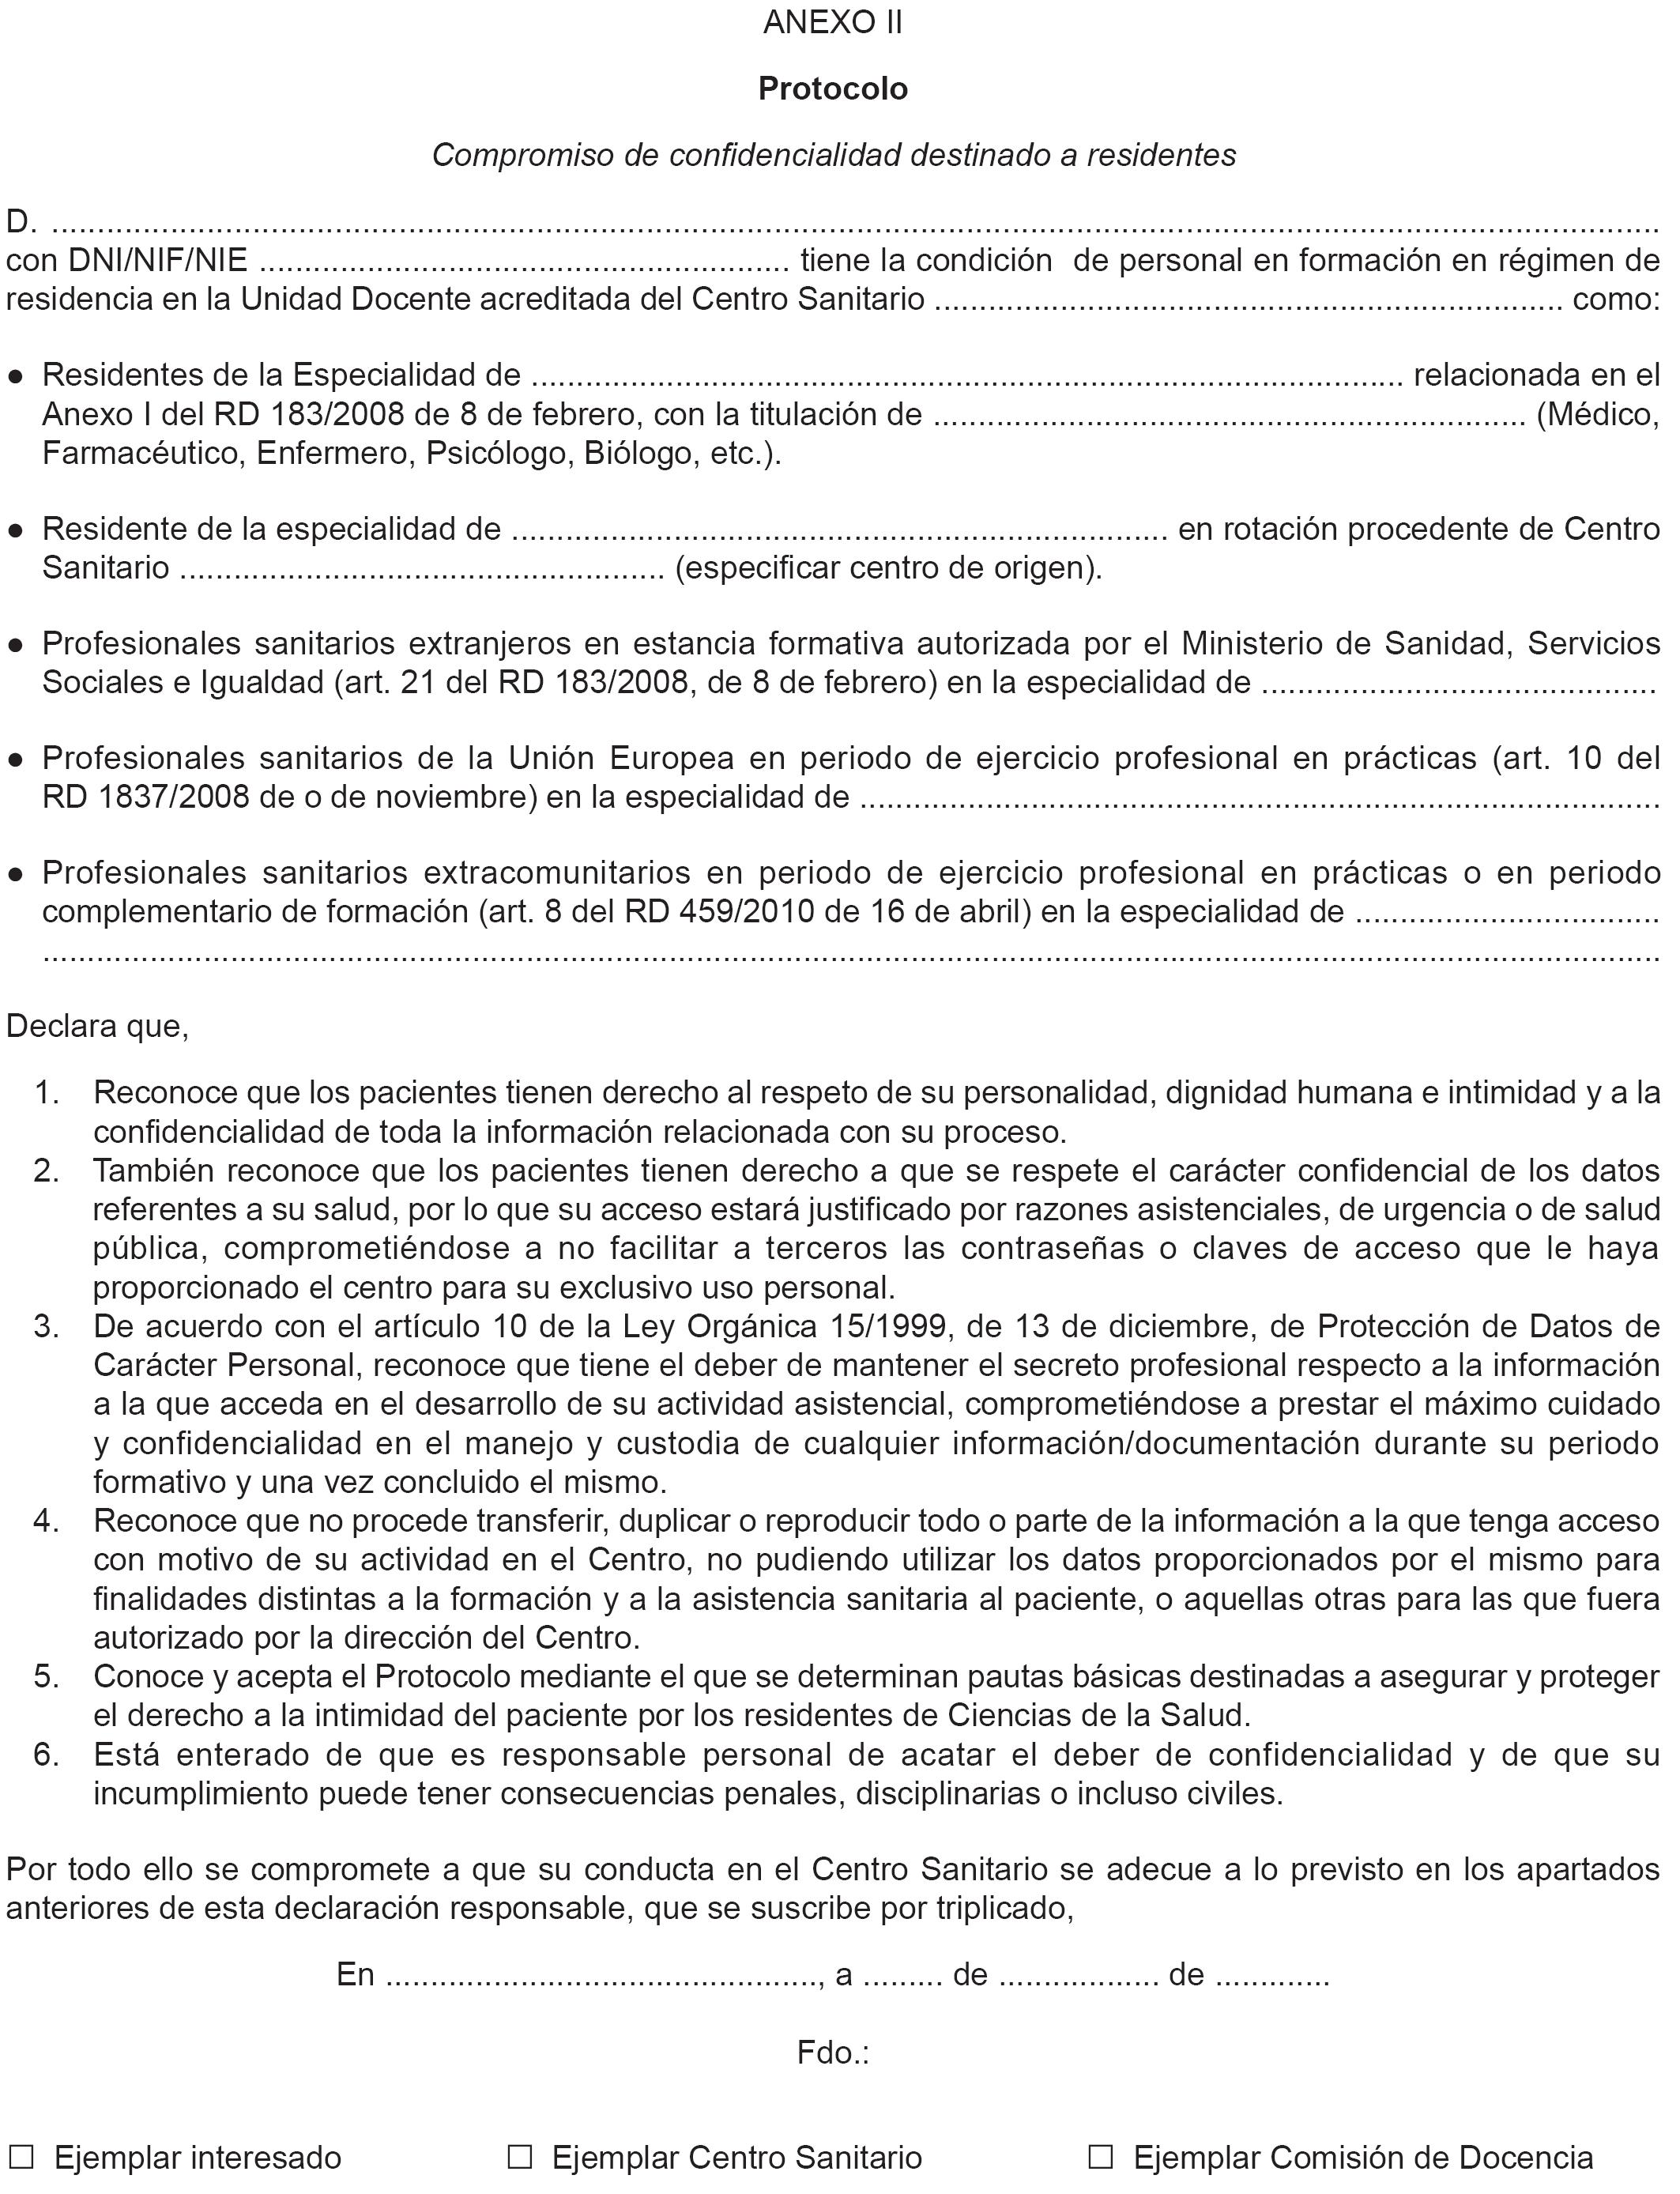 BOE.es - Documento BOE-A-2017-1200